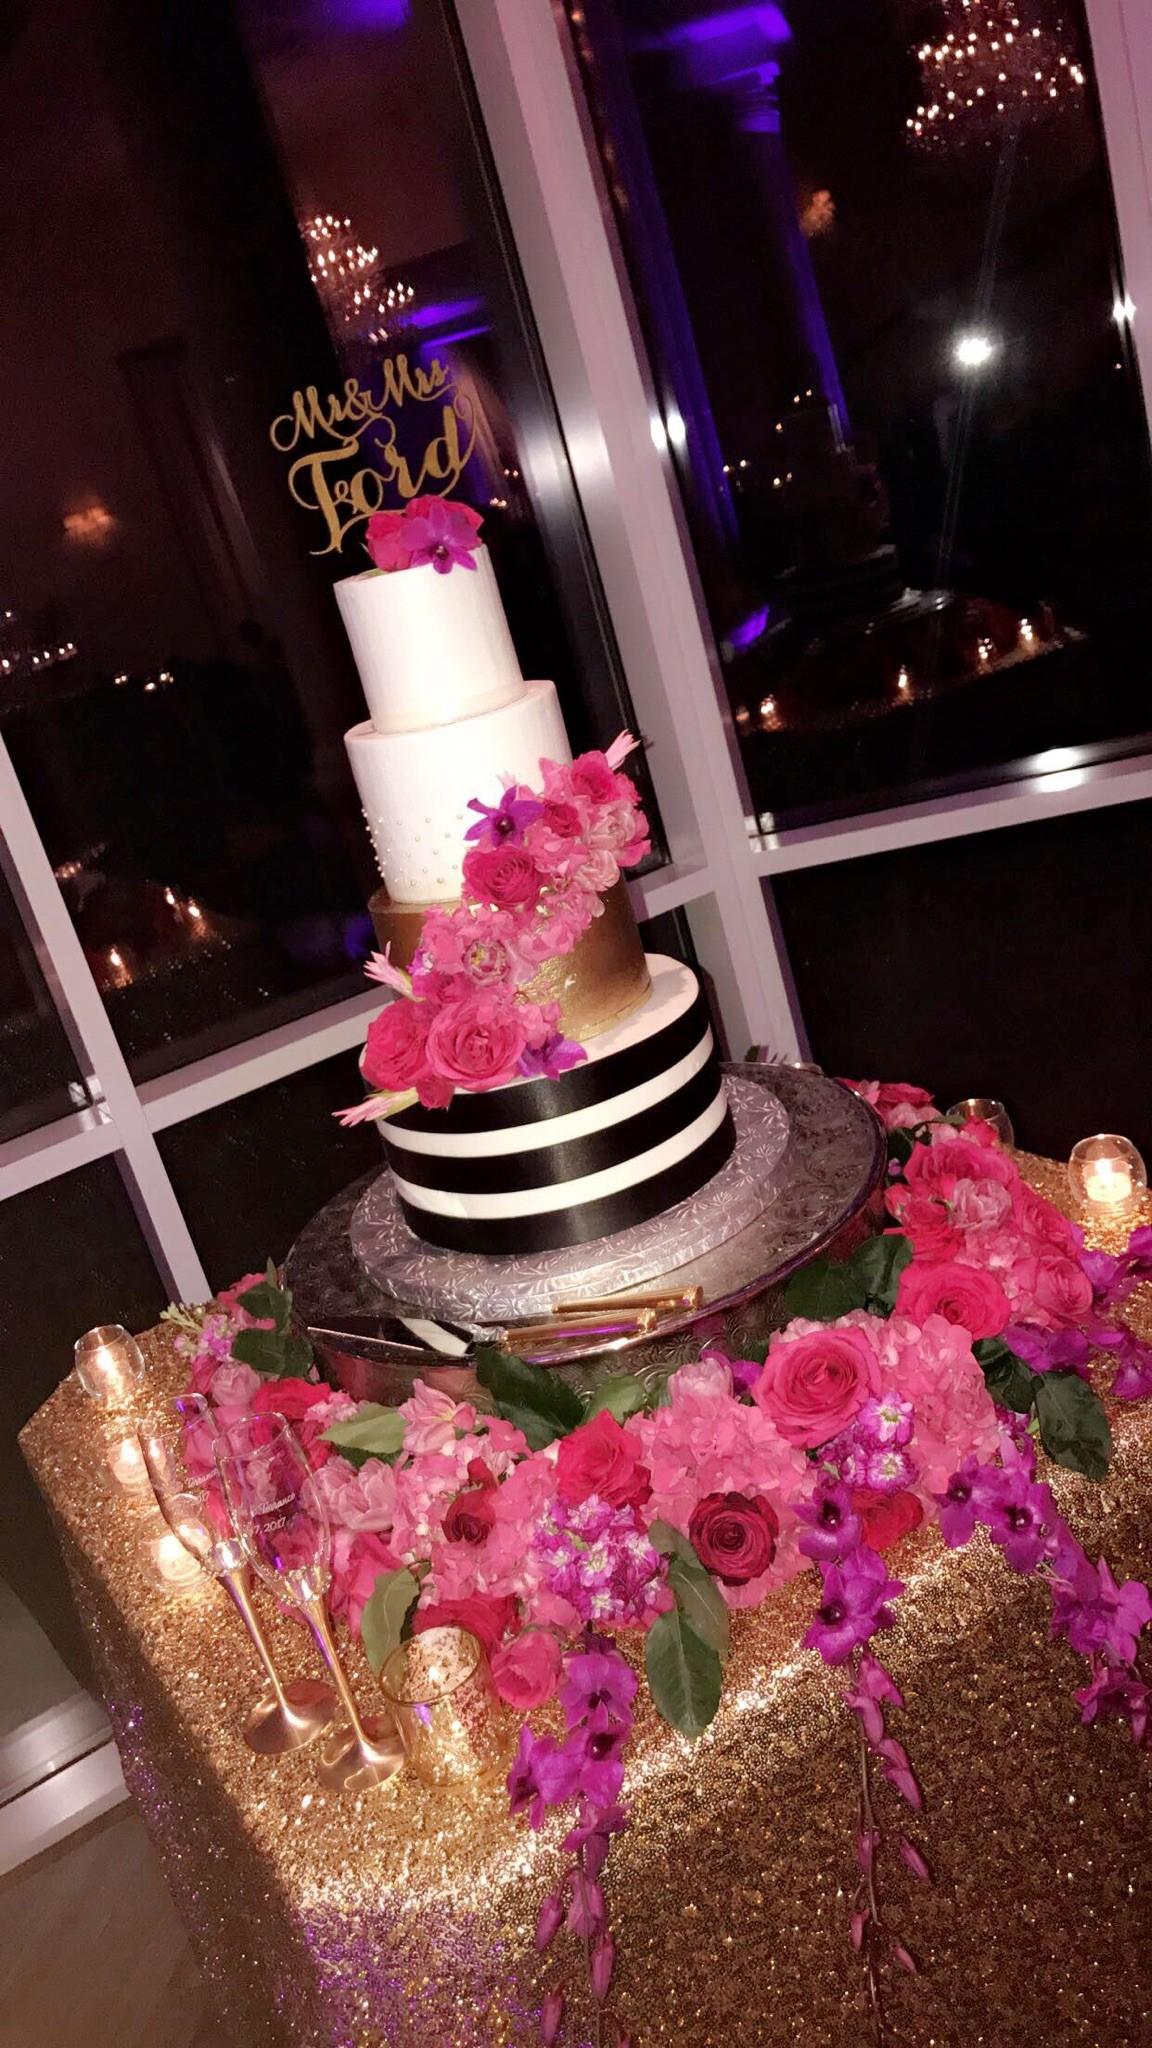 Wedding Cakes by Tammy Allen image 26